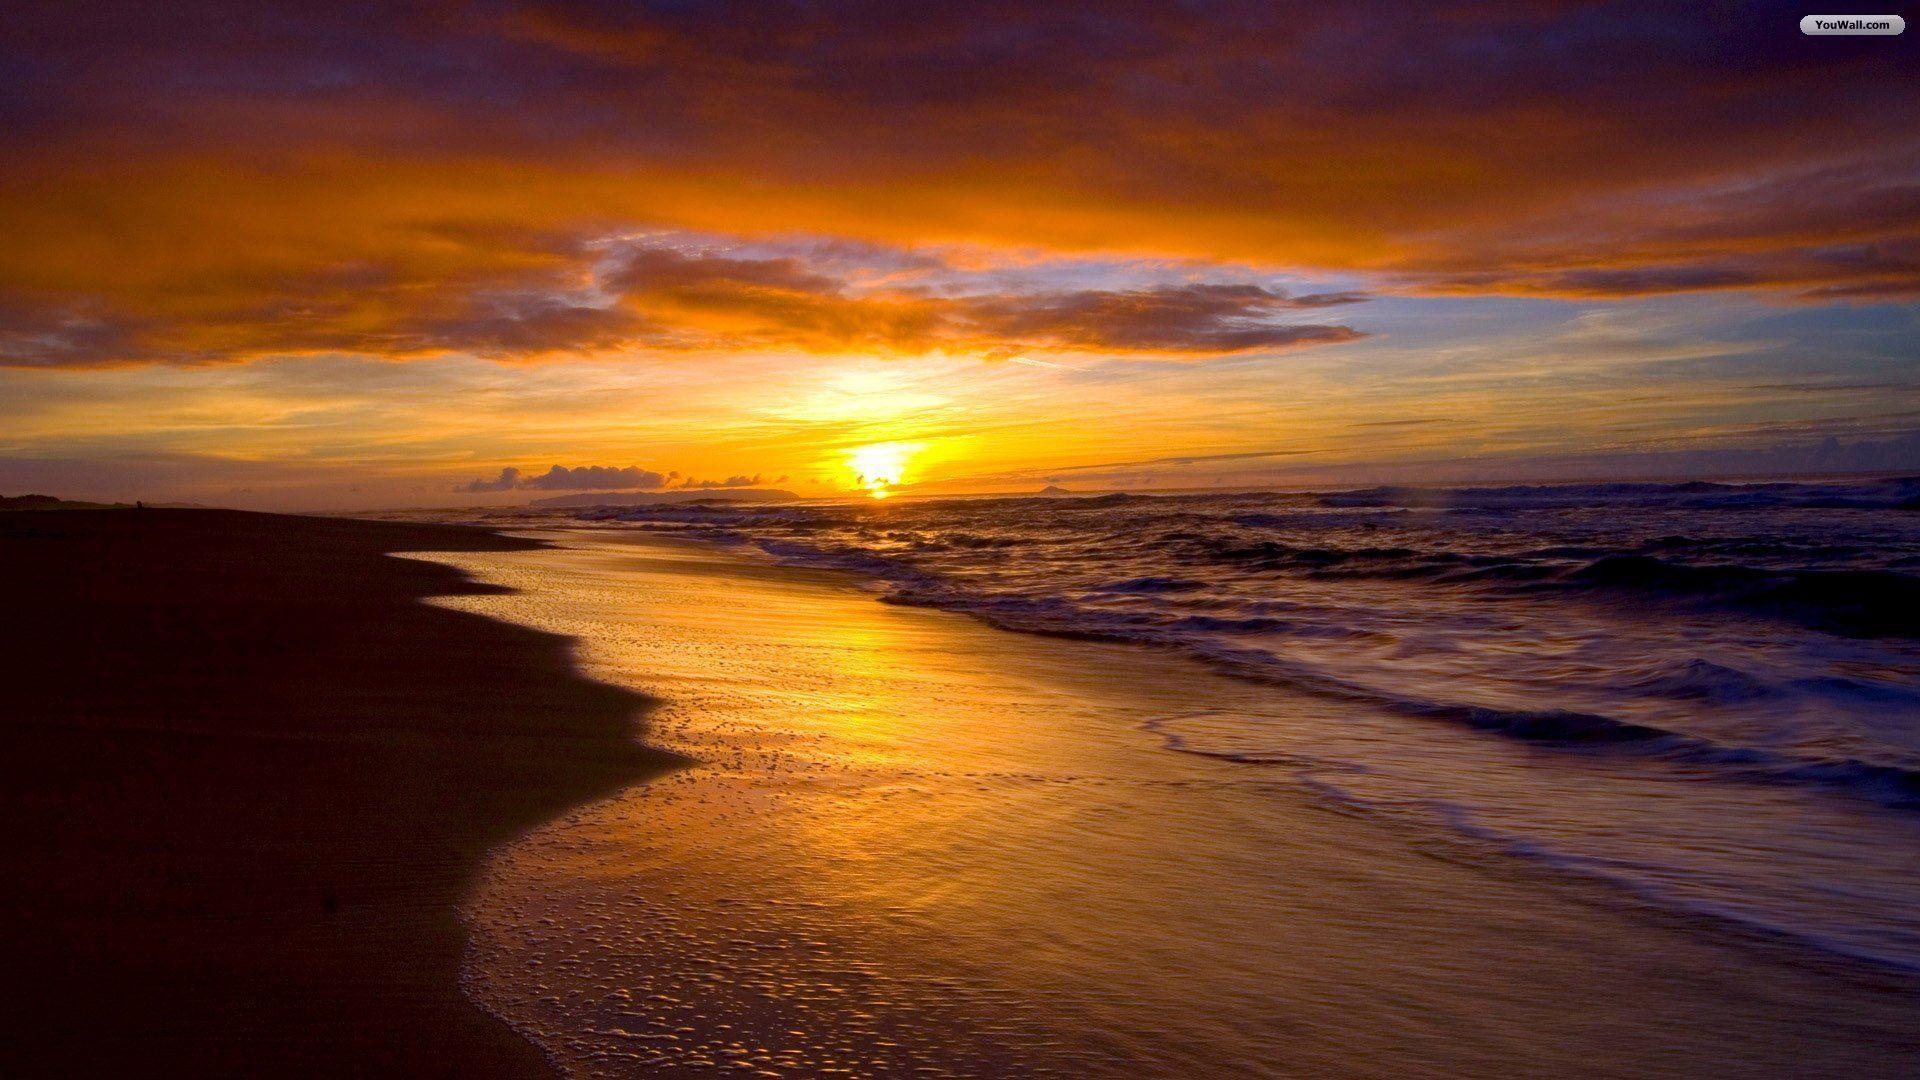 Free Beach Sunset Wallpapers Wallpaper Cave